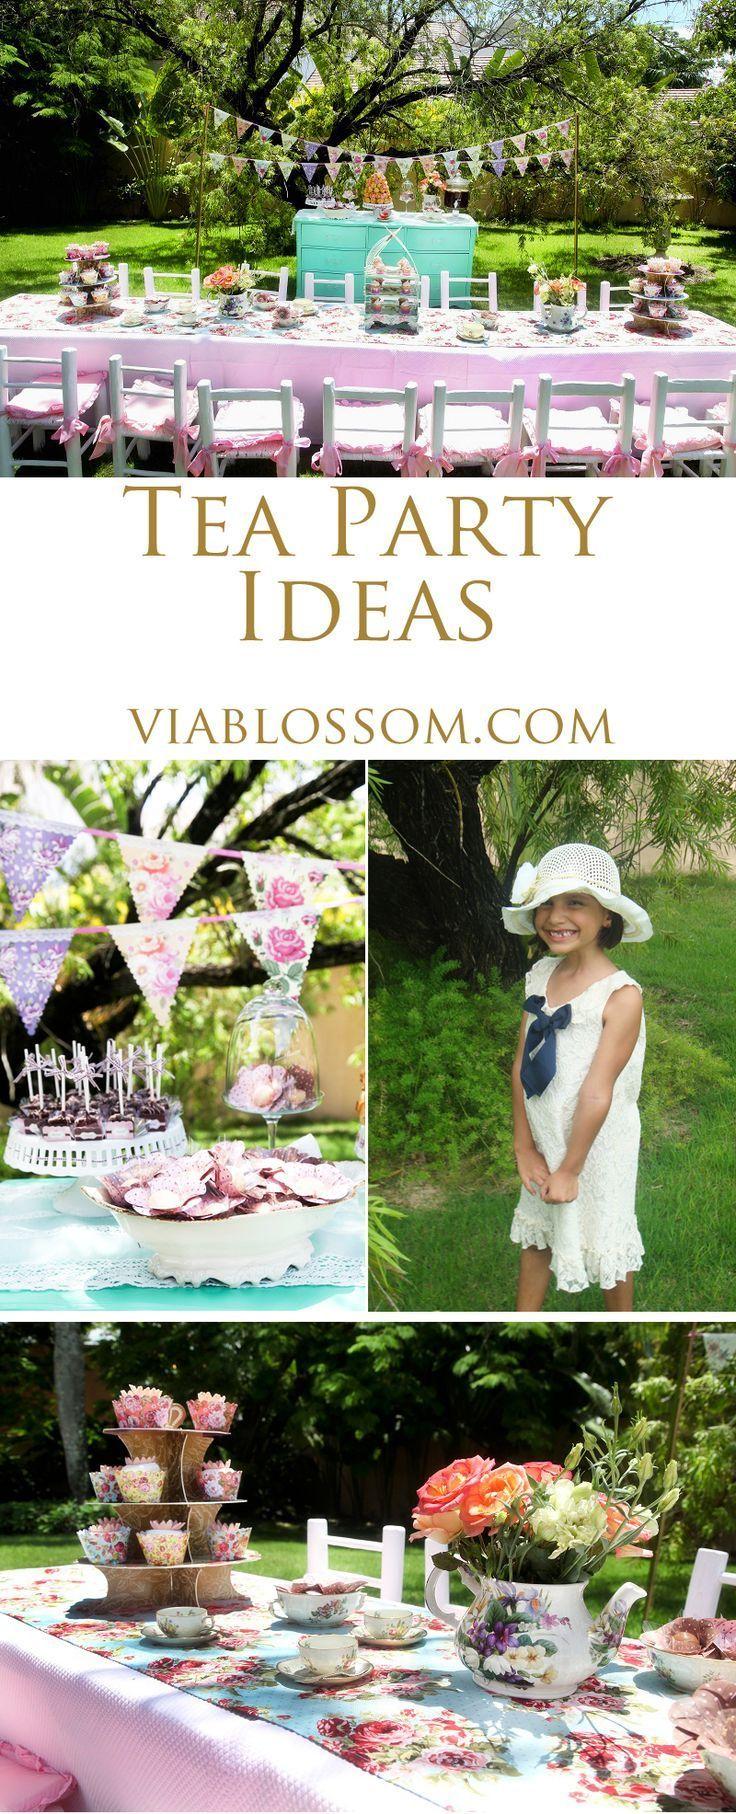 Scrumptious Tea Party - Via Blossom Tea Party Ideas | Tea party ...